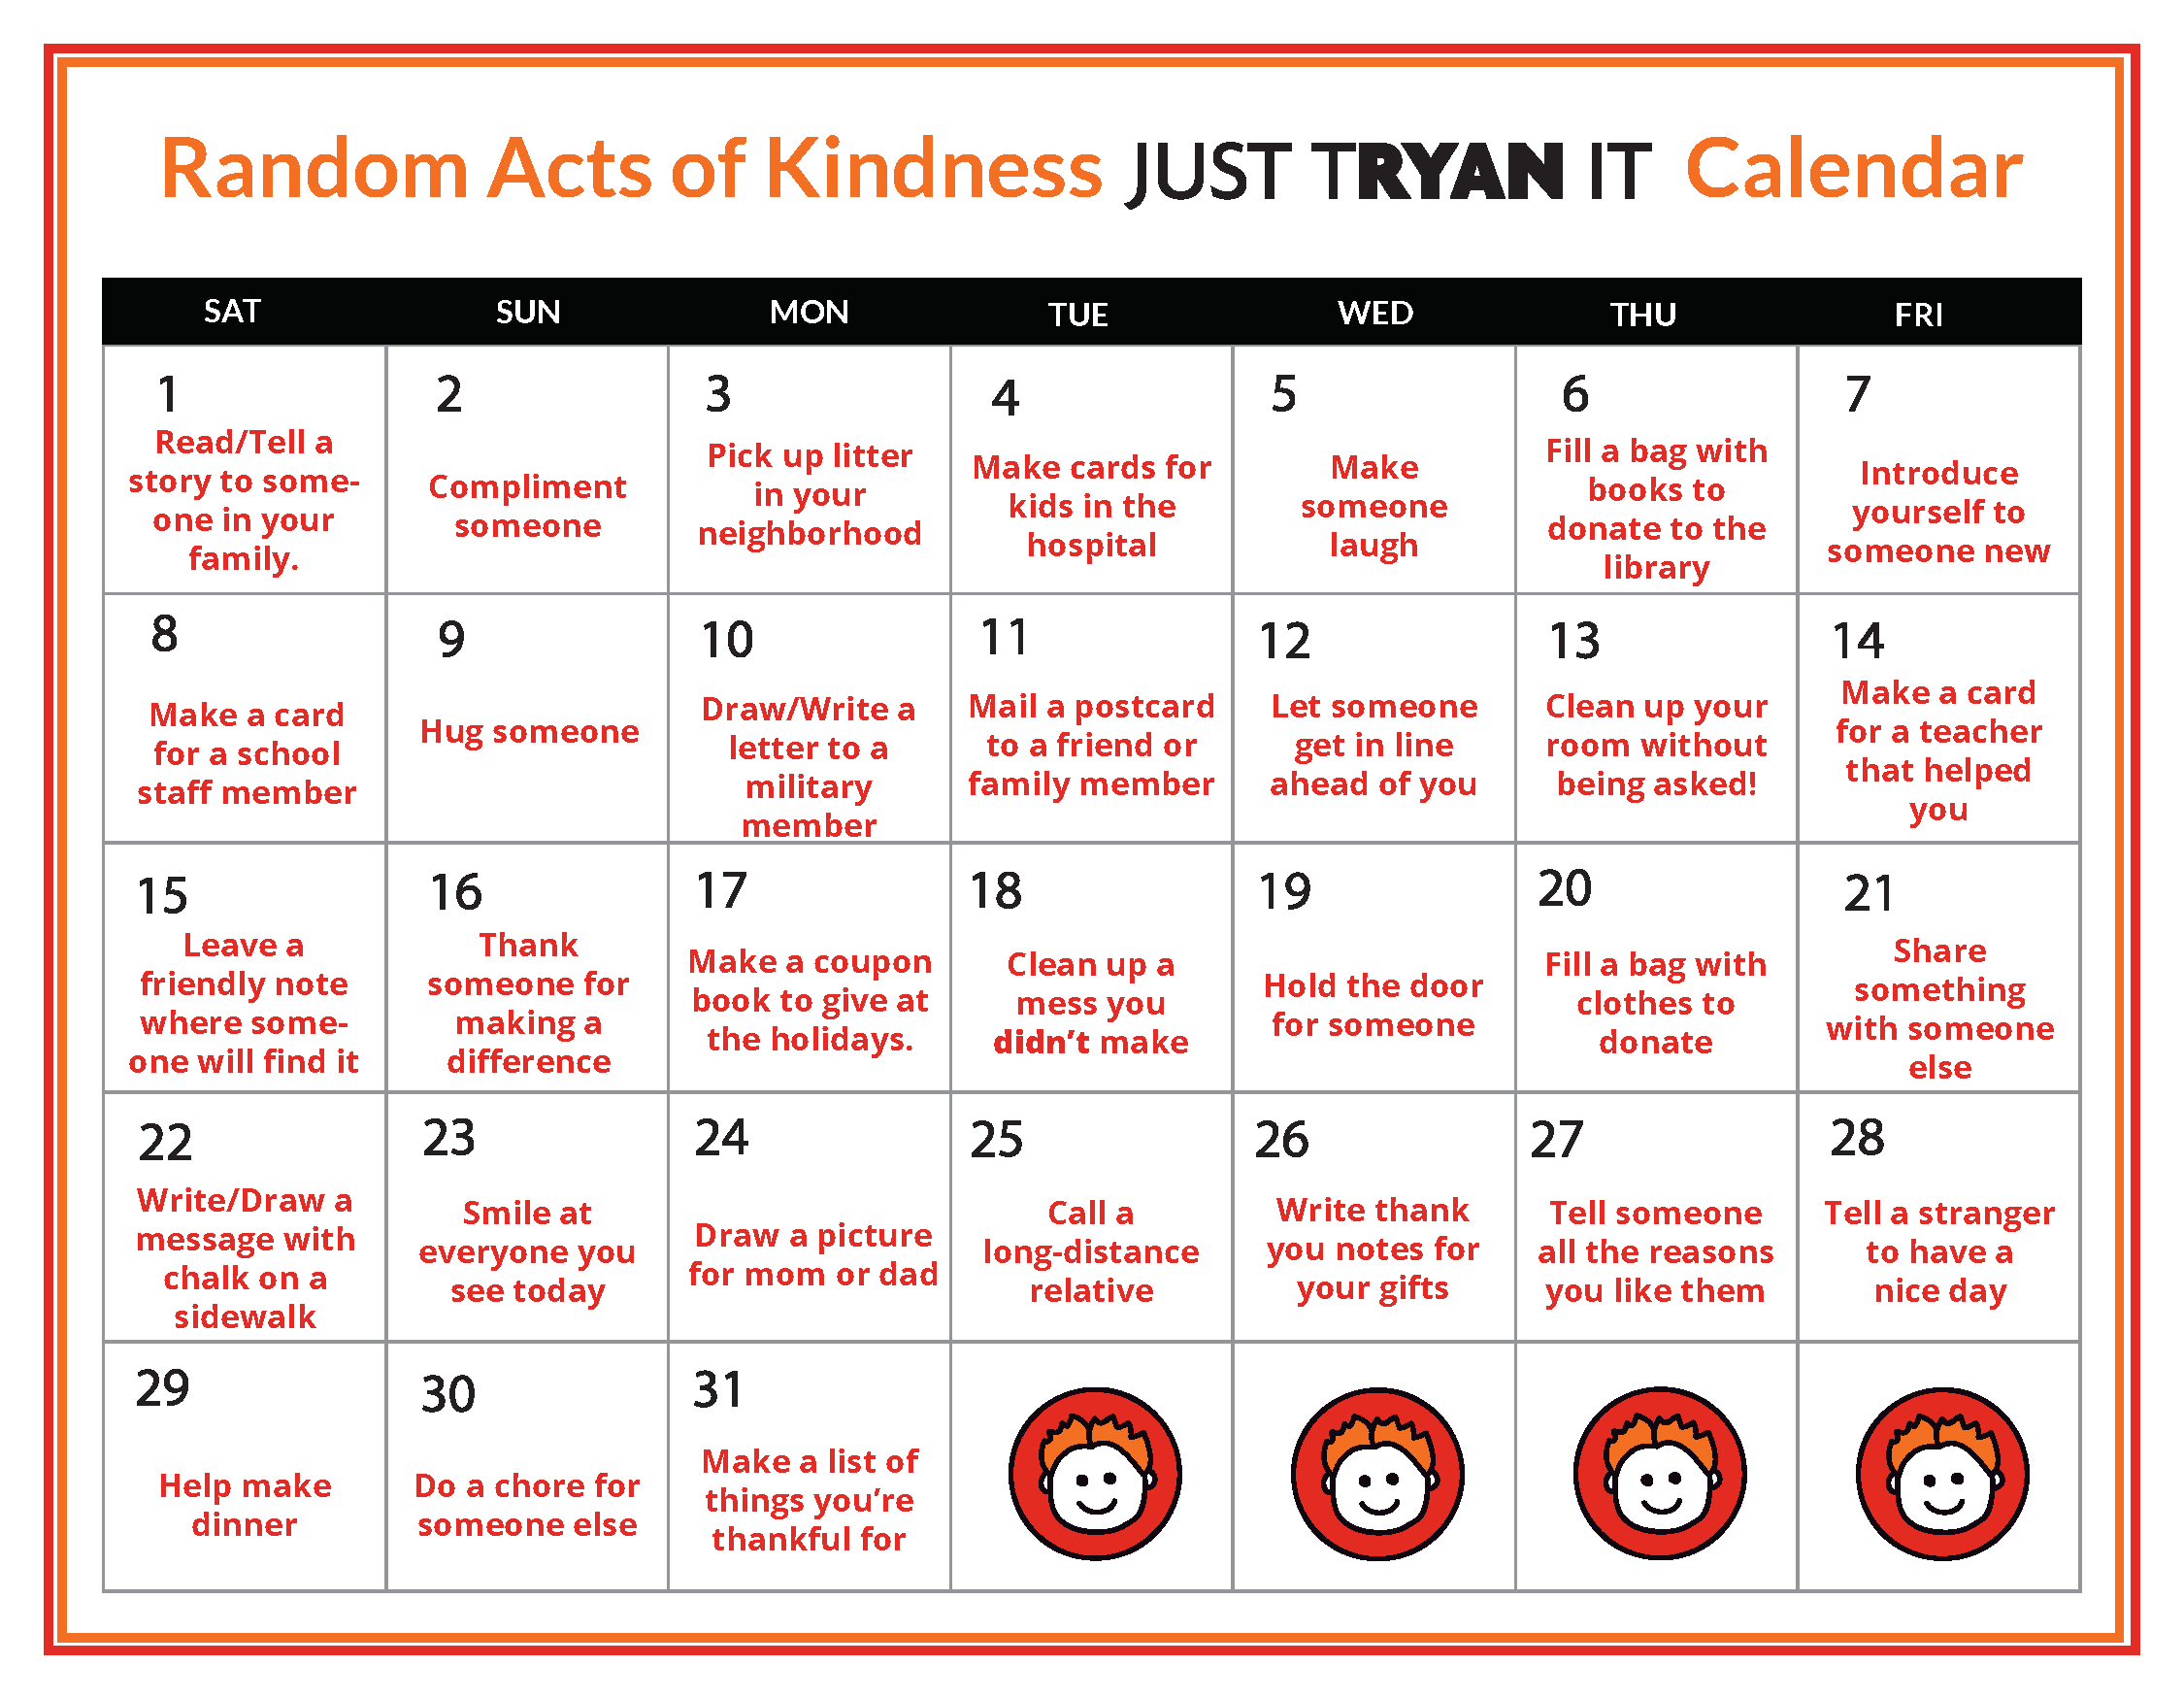 Random Acts of Kindness Calendar